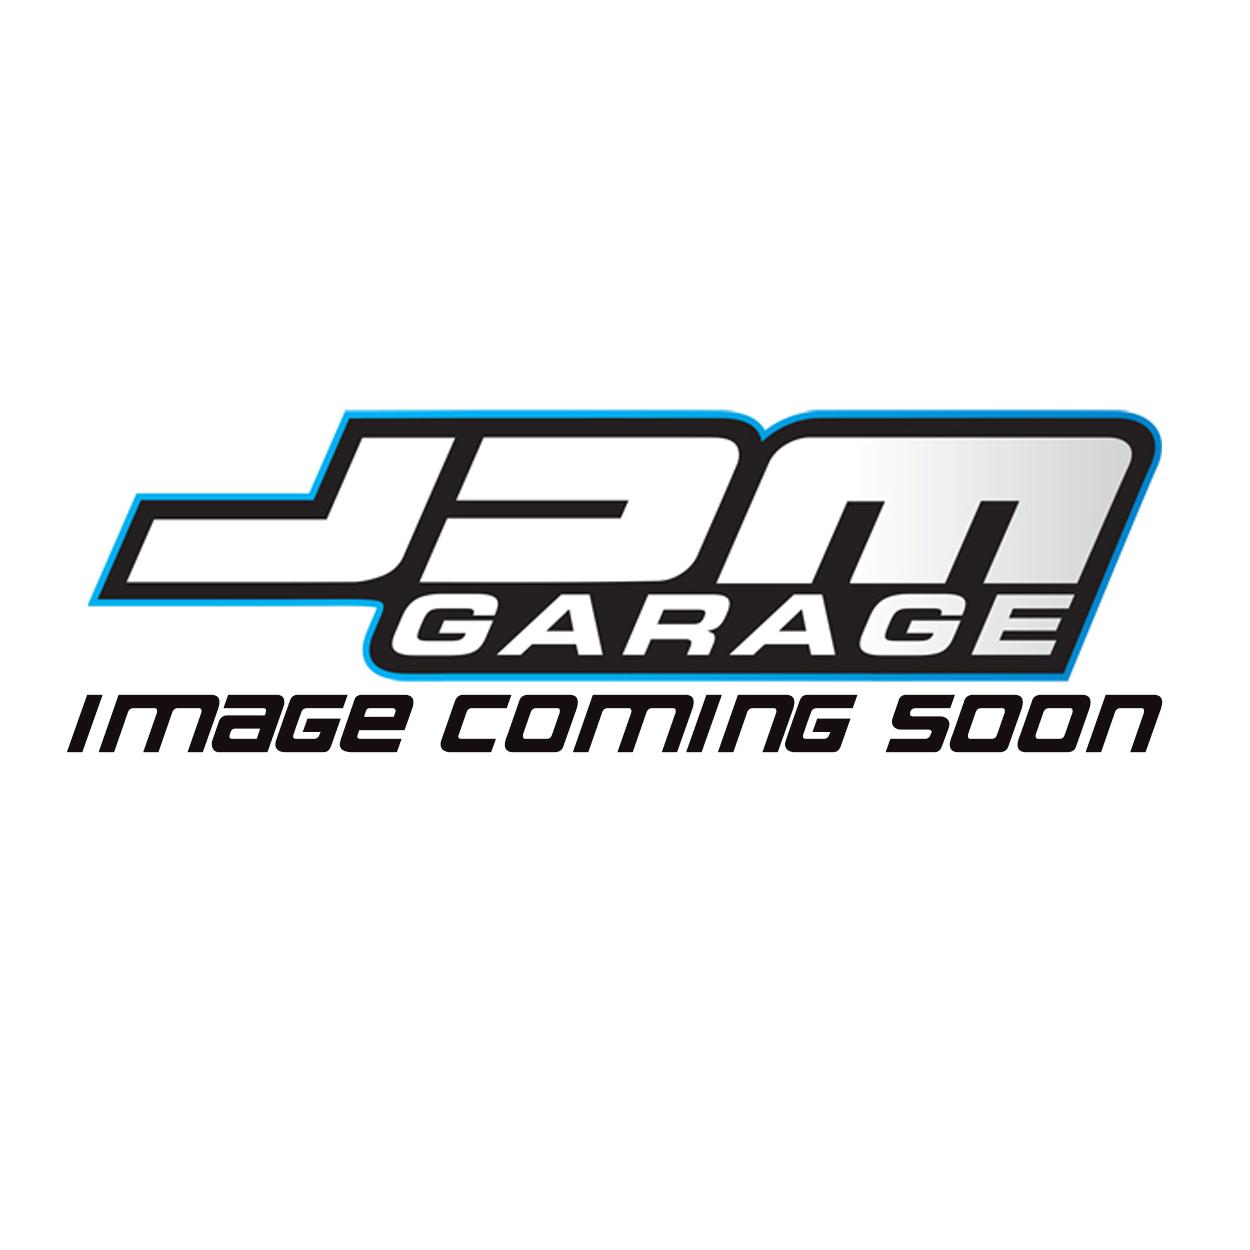 JDMGarageUK Premium PPY Car Air Freshener